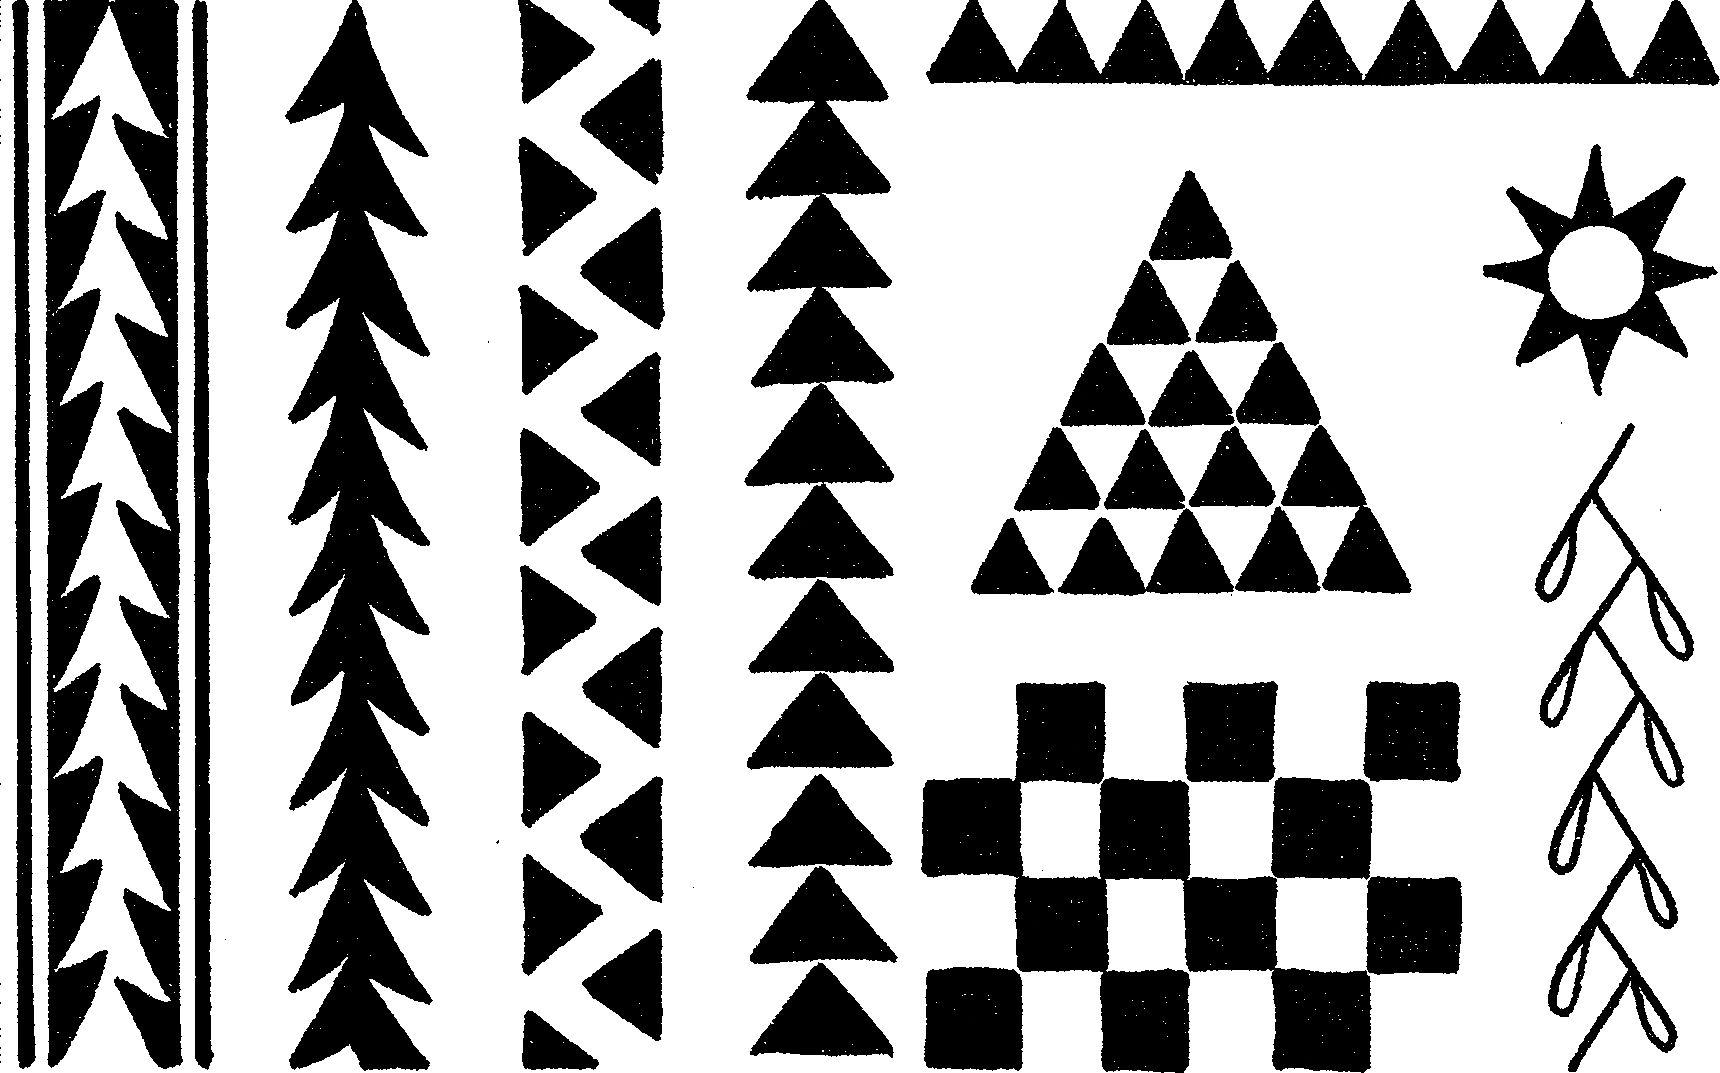 tatouage triangle signification - Recherche Google ...